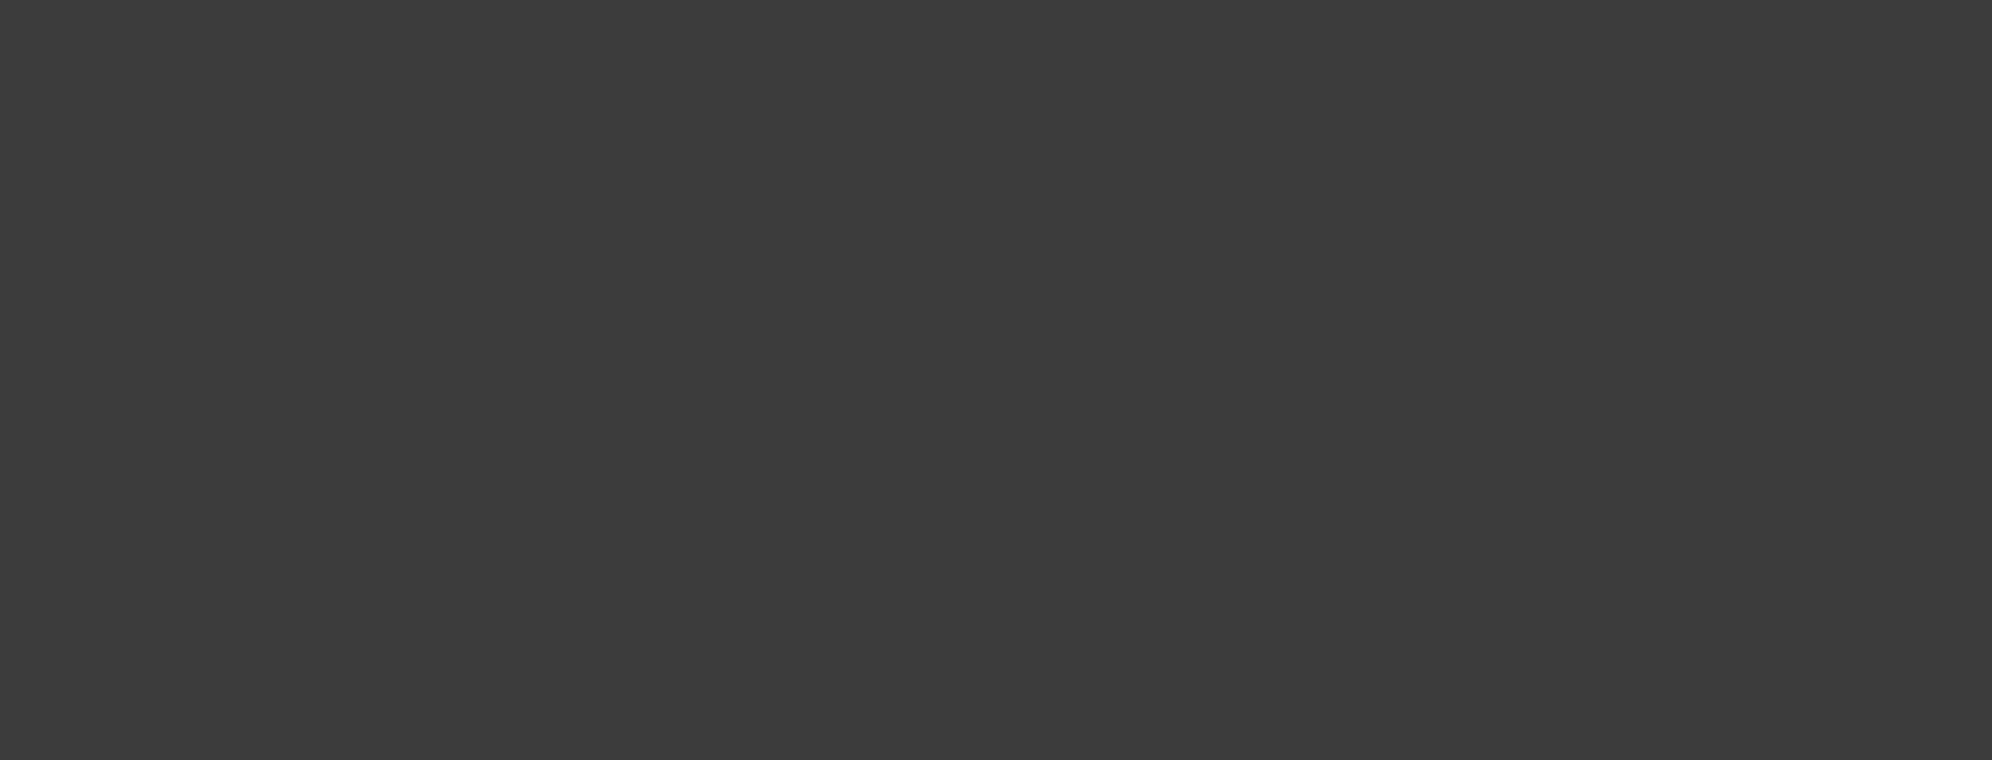 Collabora   Open Source Consulting   GStreamer